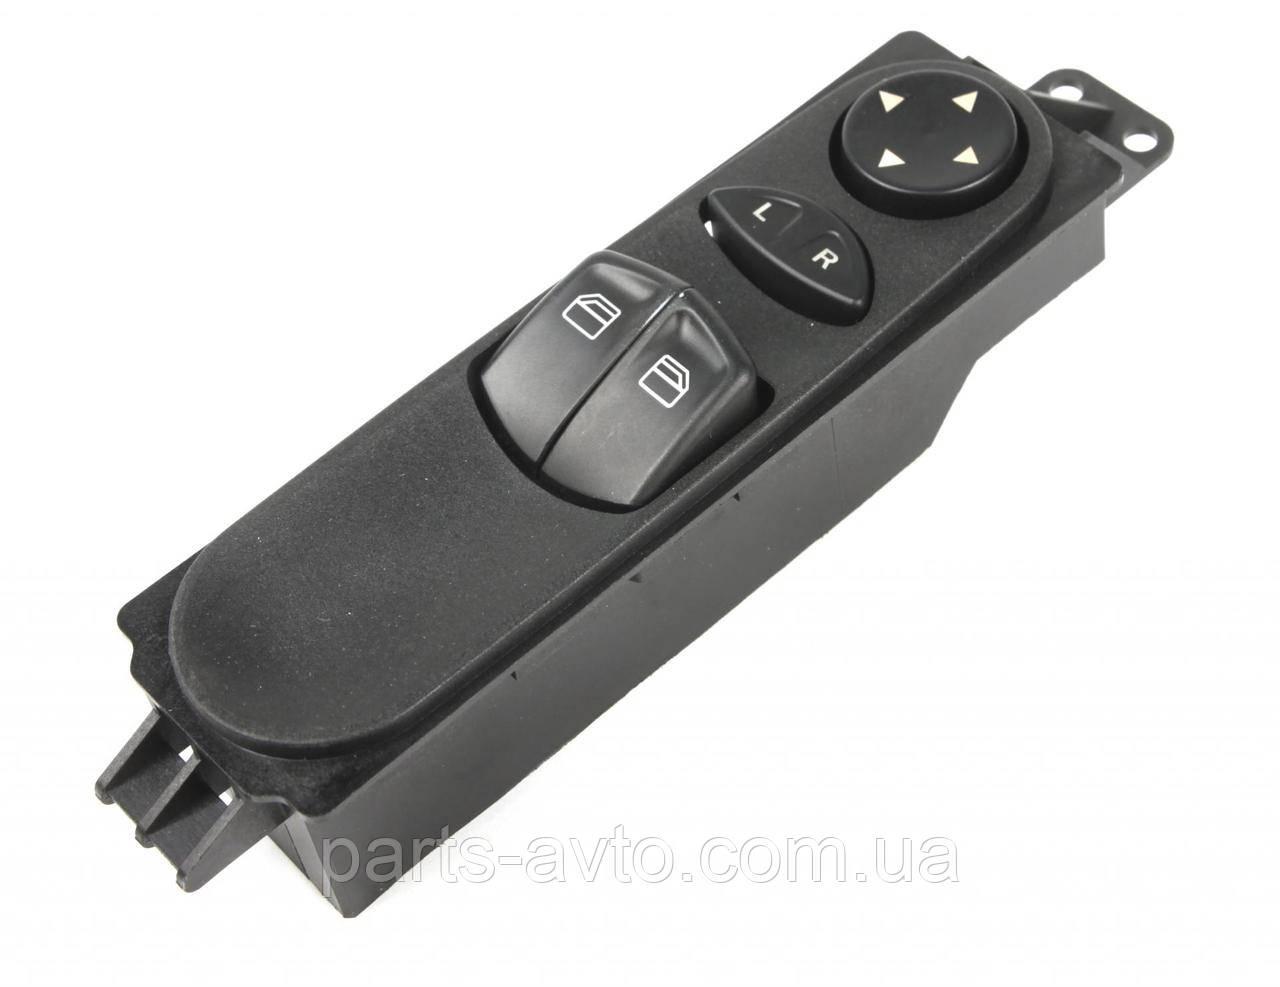 Кнопка стеклоподъемника левая блок  Mercedes Vito W639 03-  AUTOTECHTEILE 100 5520, 6395450113, 6395450913